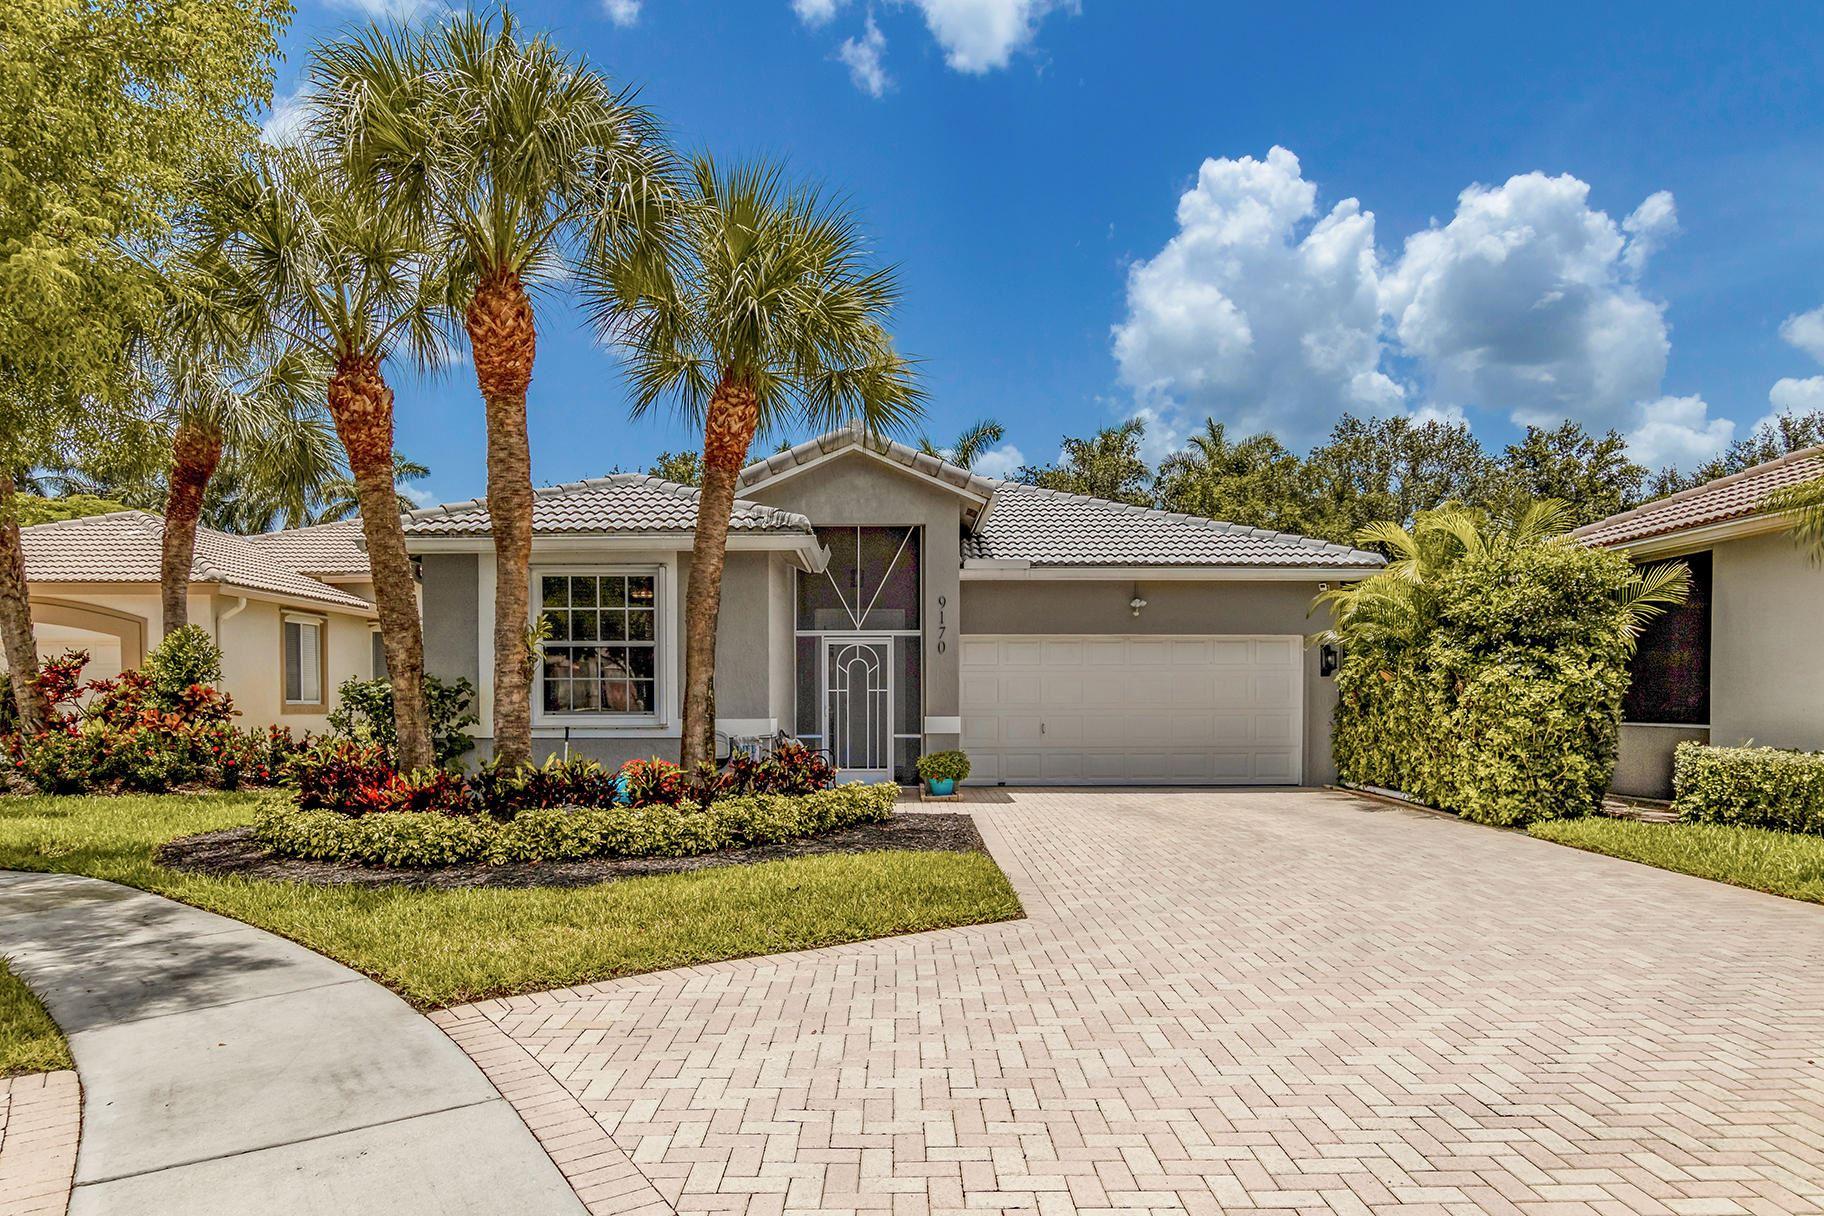 9170 Bay Point Circle, West Palm Beach, FL 33411 - #: RX-10634616